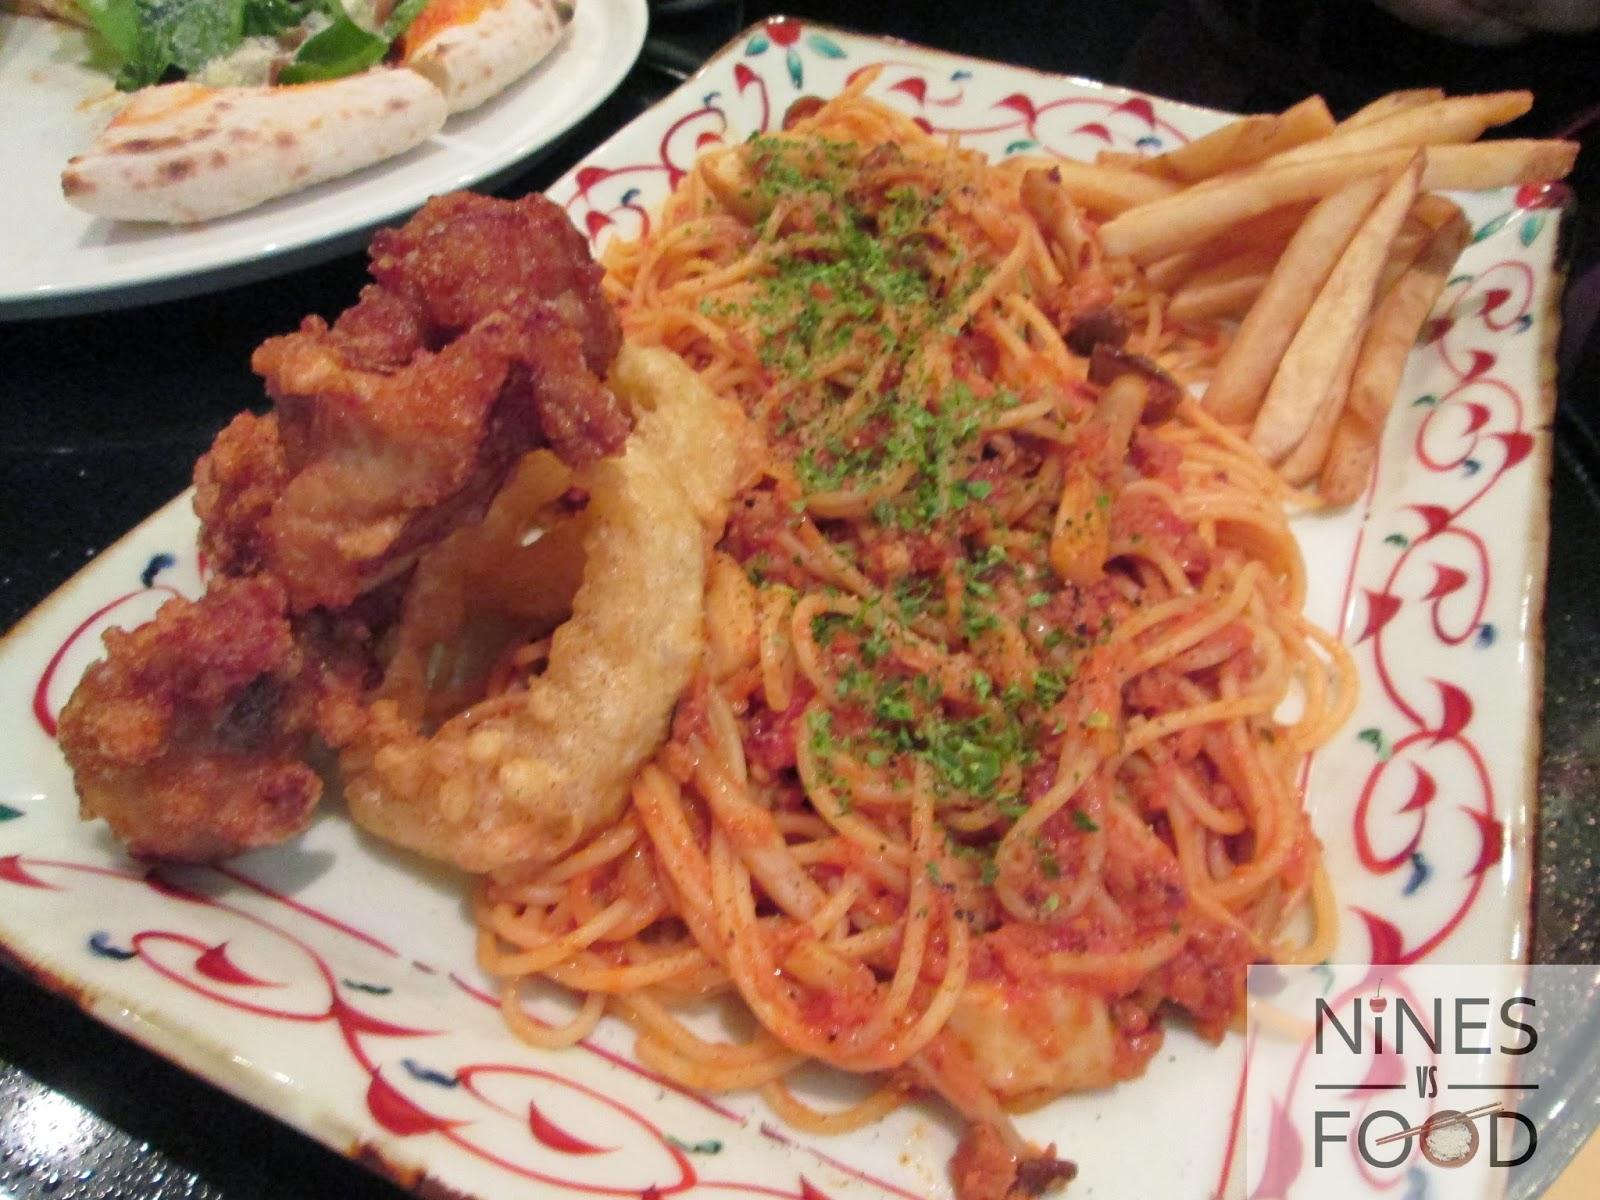 Nines vs. Food - Yomenya Goemon Greenbelt 3 - 21.jpg